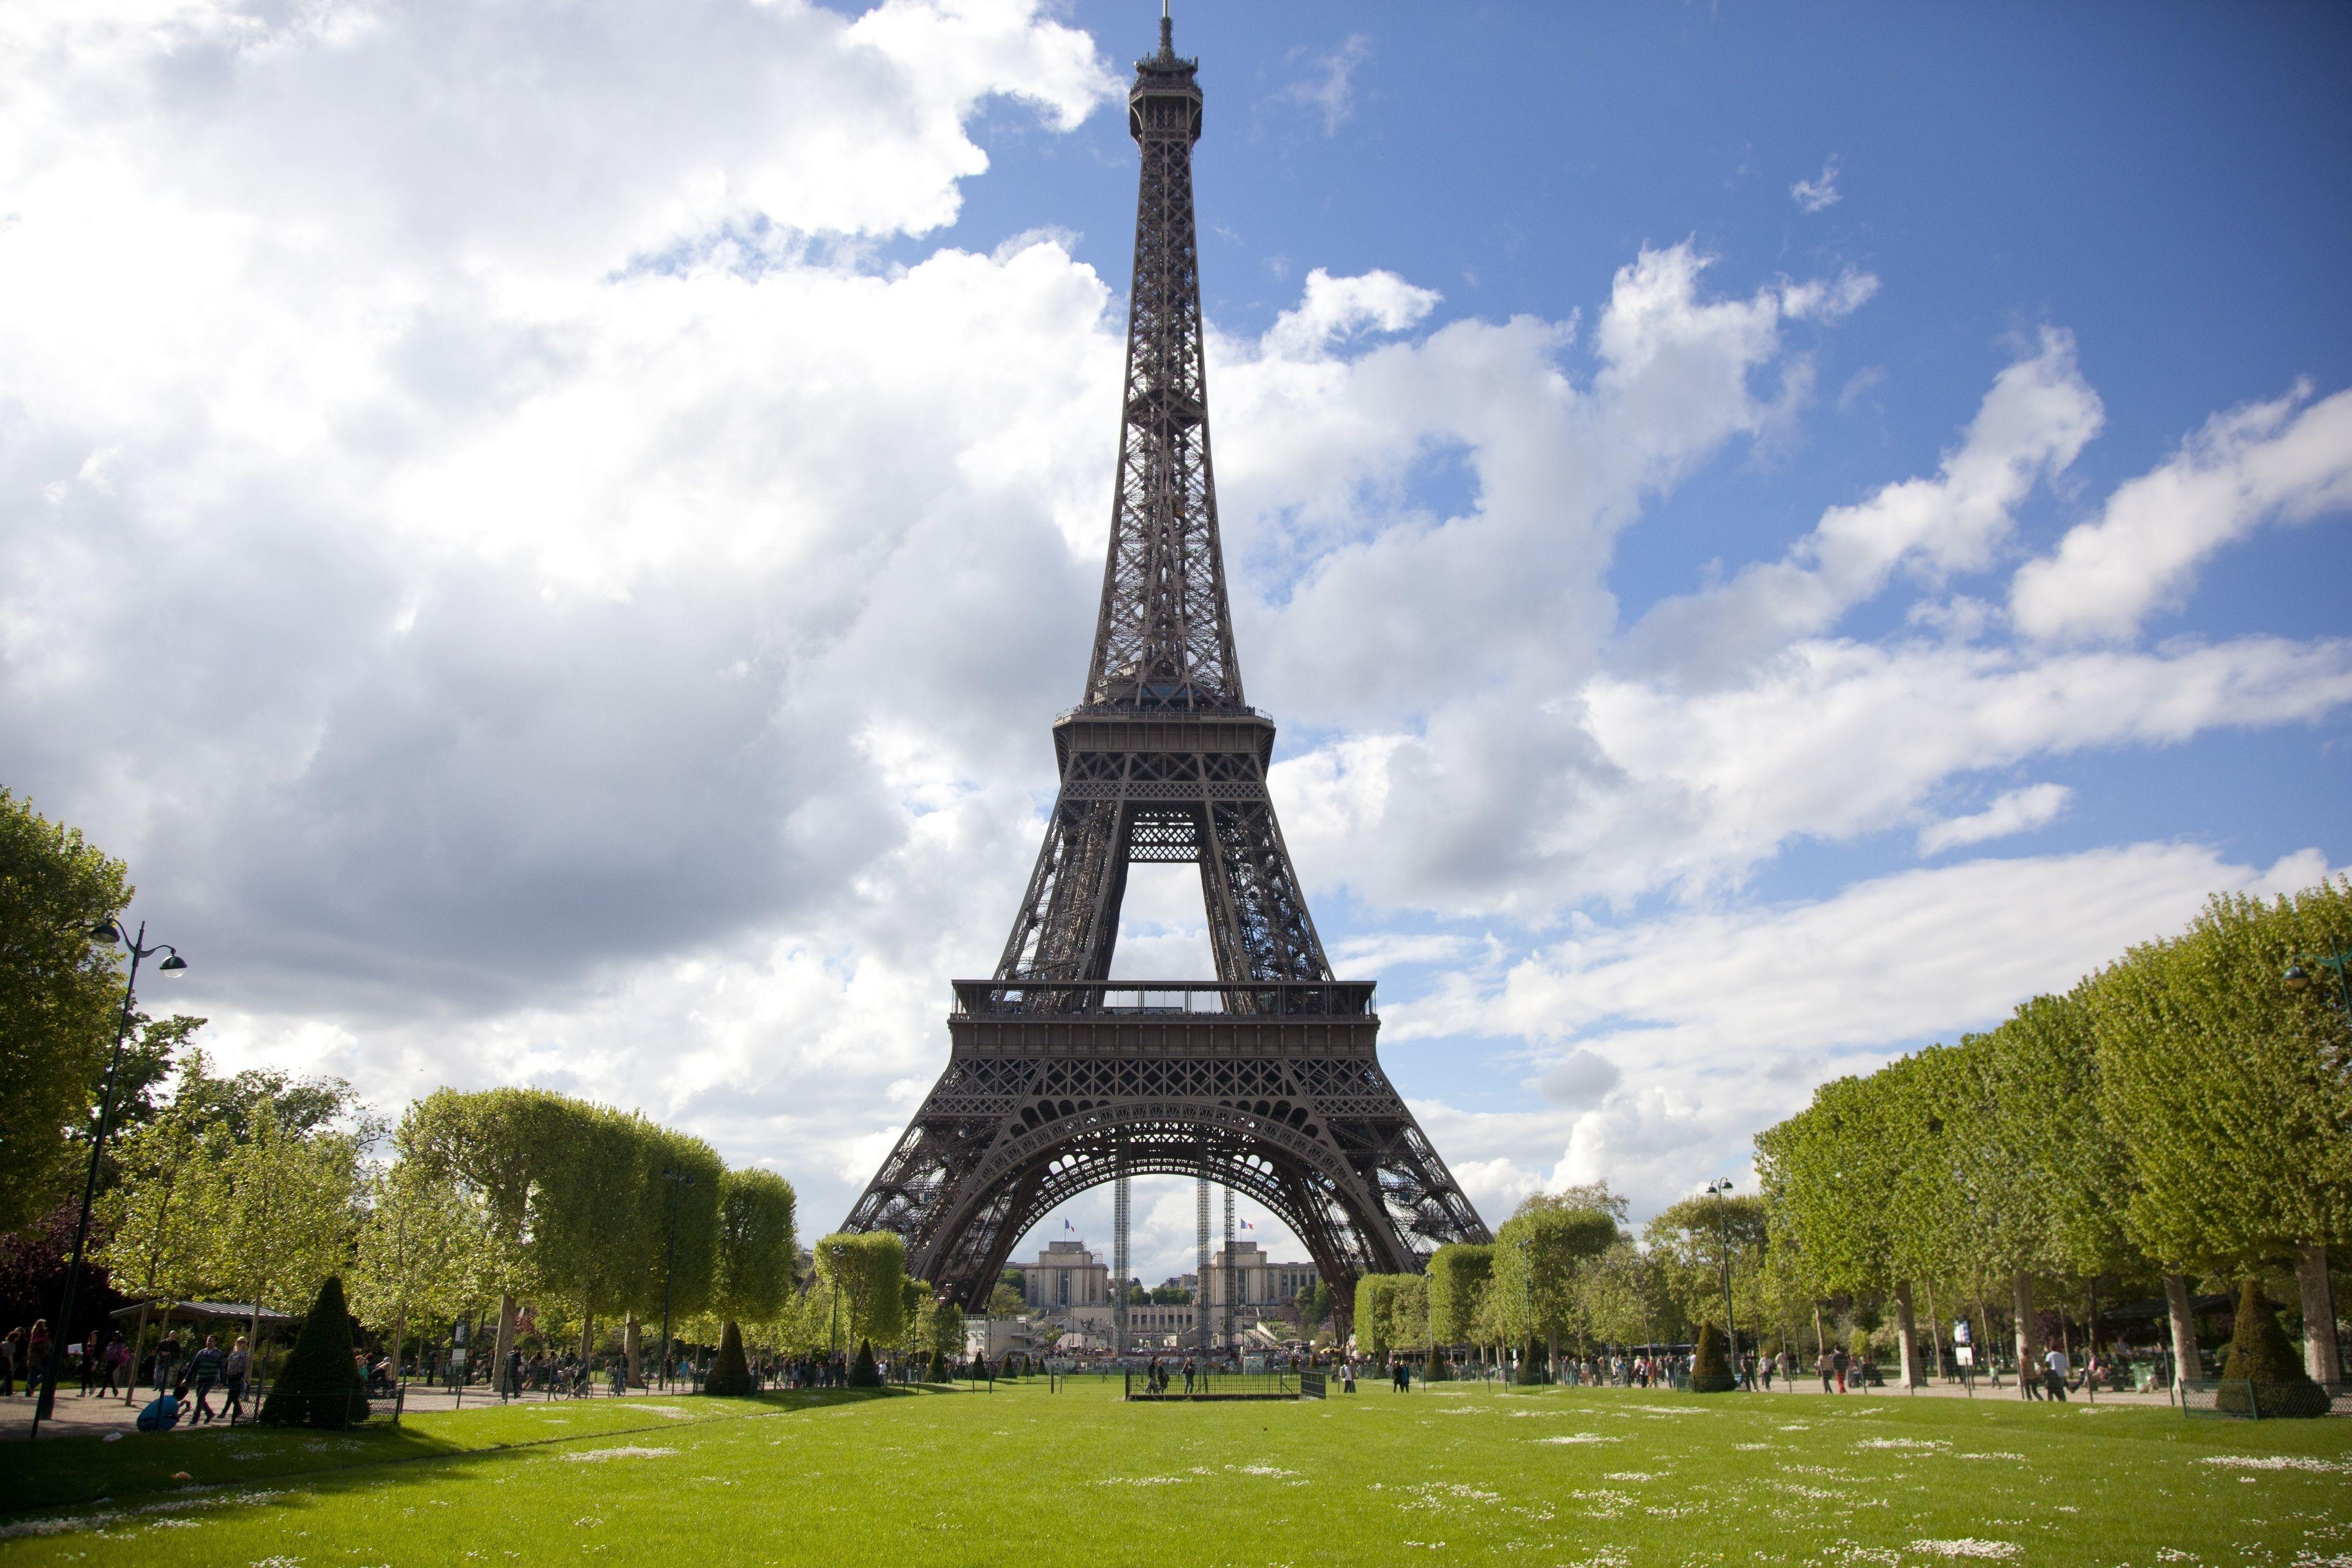 Eiffel Tower Climbing Tour & Glass Floor Experience